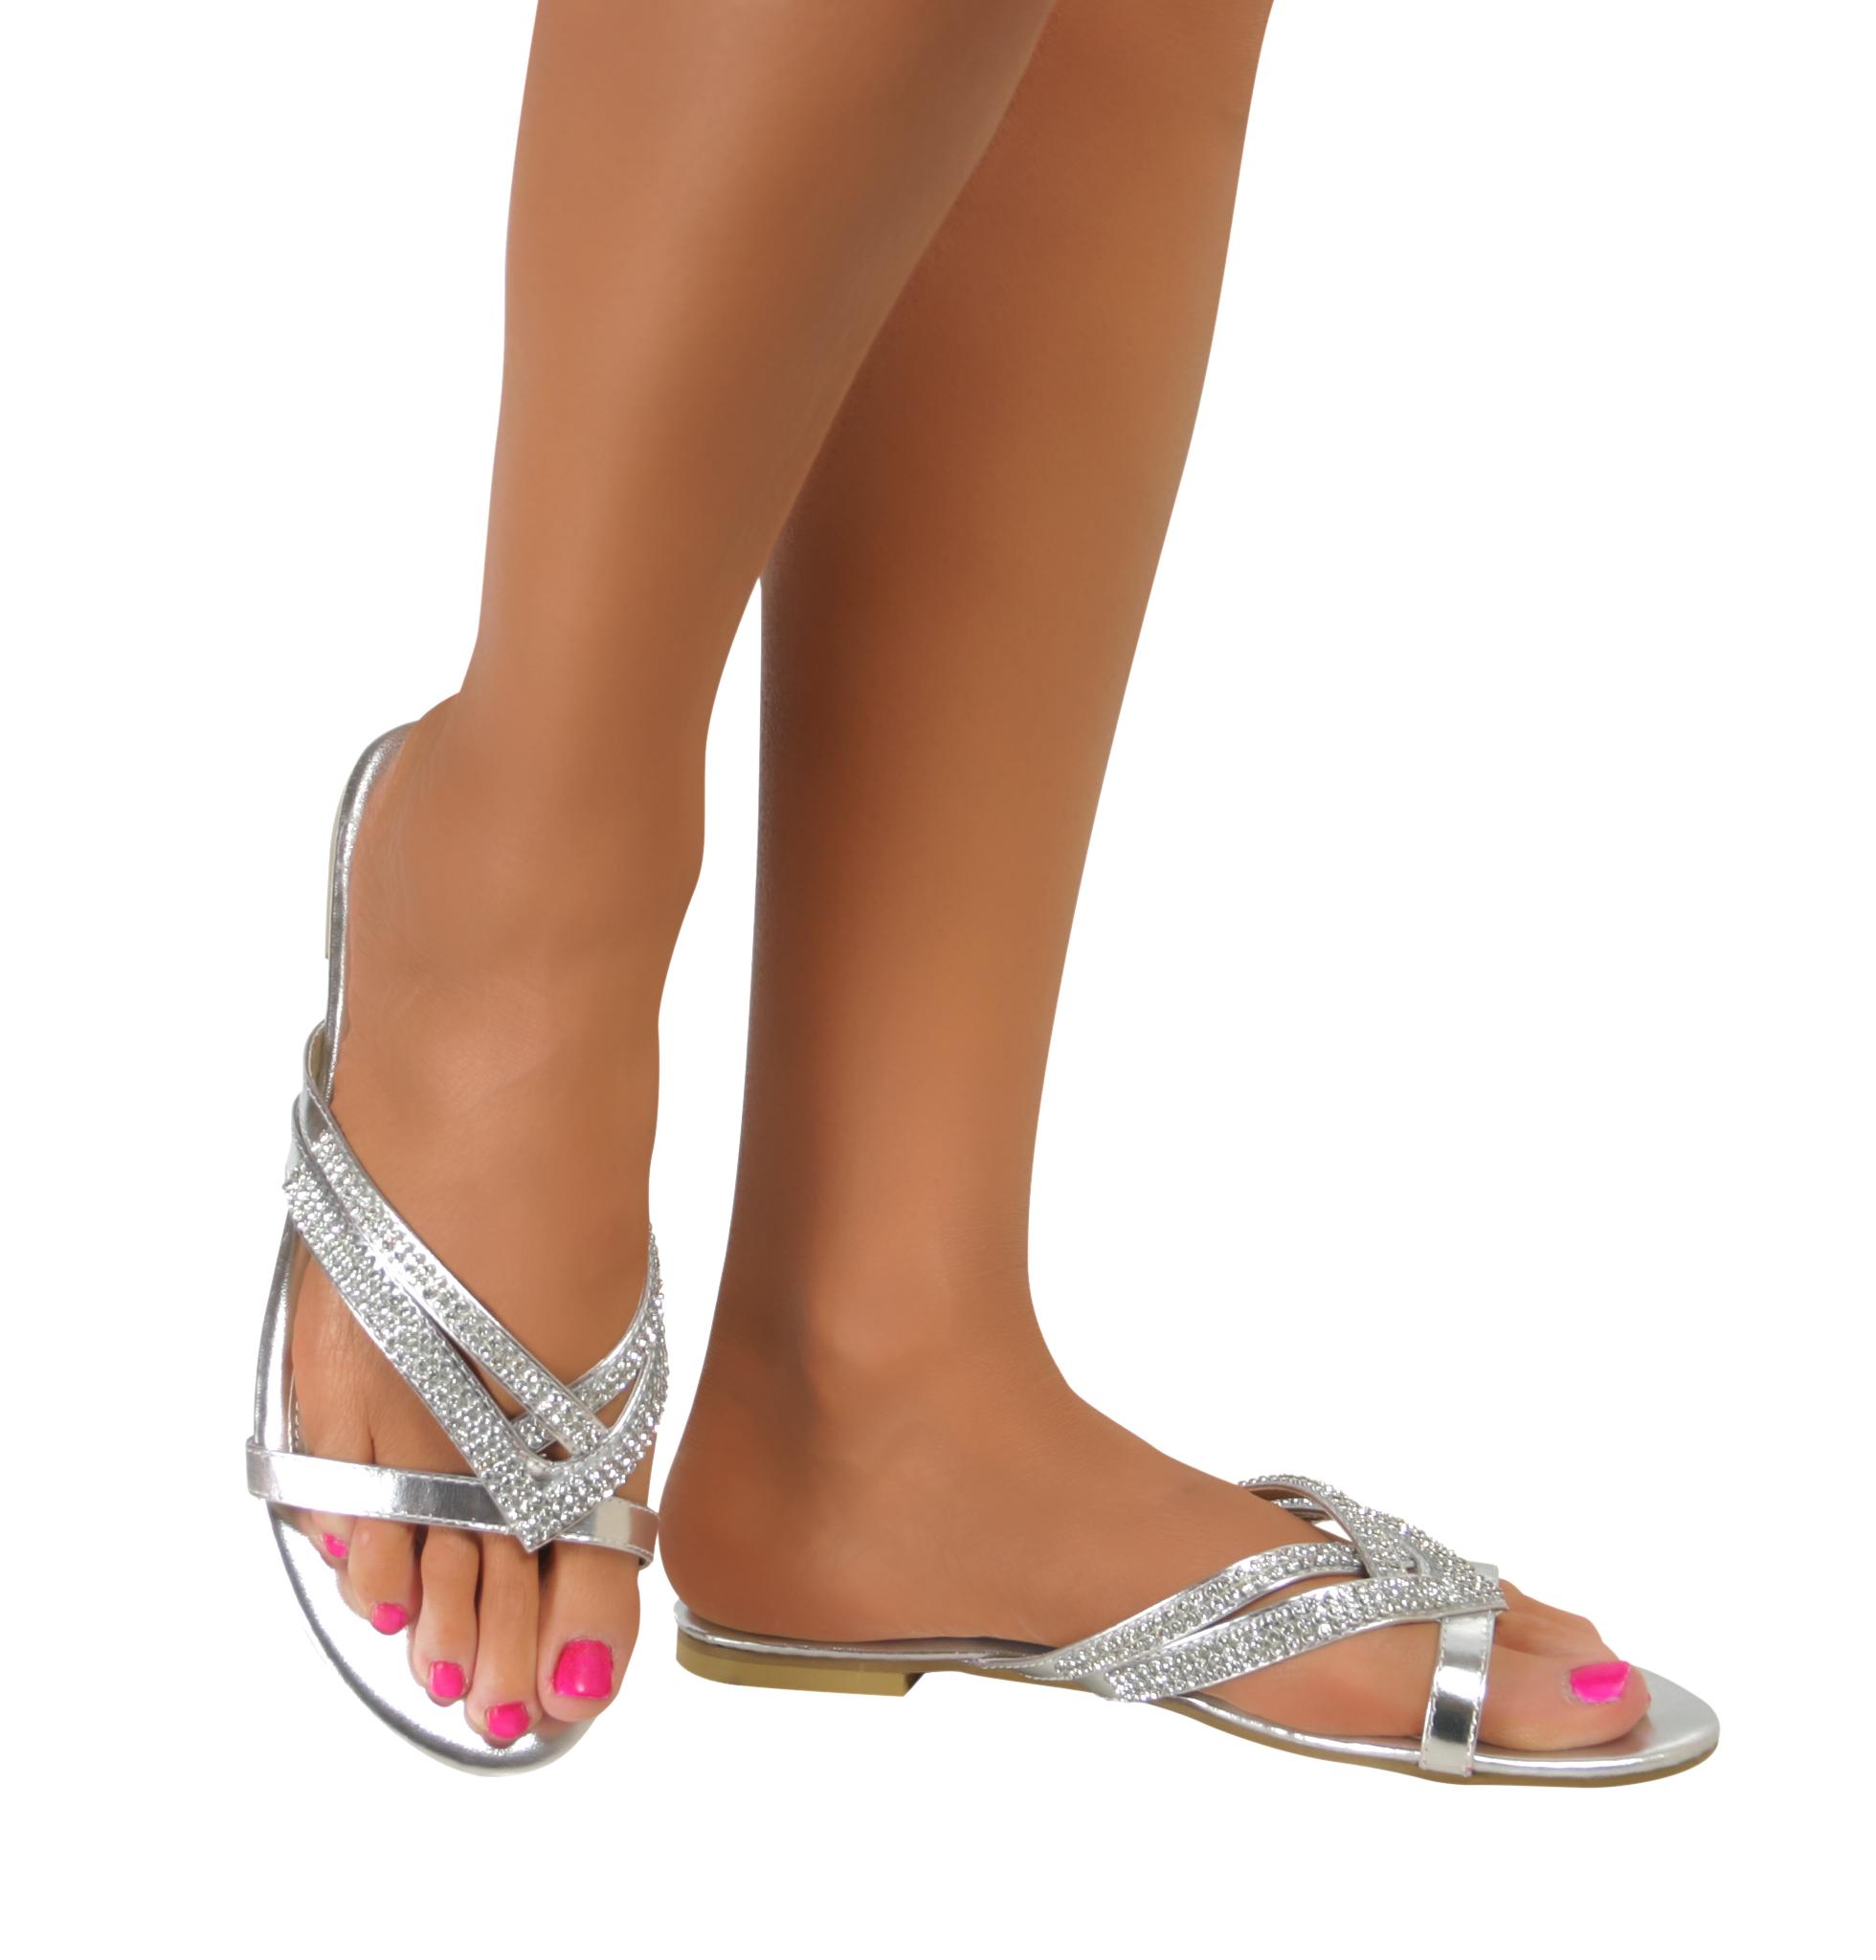 damen silber strass glitzer flip flops braut ball strand klug sandalen uk 3 8 ebay. Black Bedroom Furniture Sets. Home Design Ideas